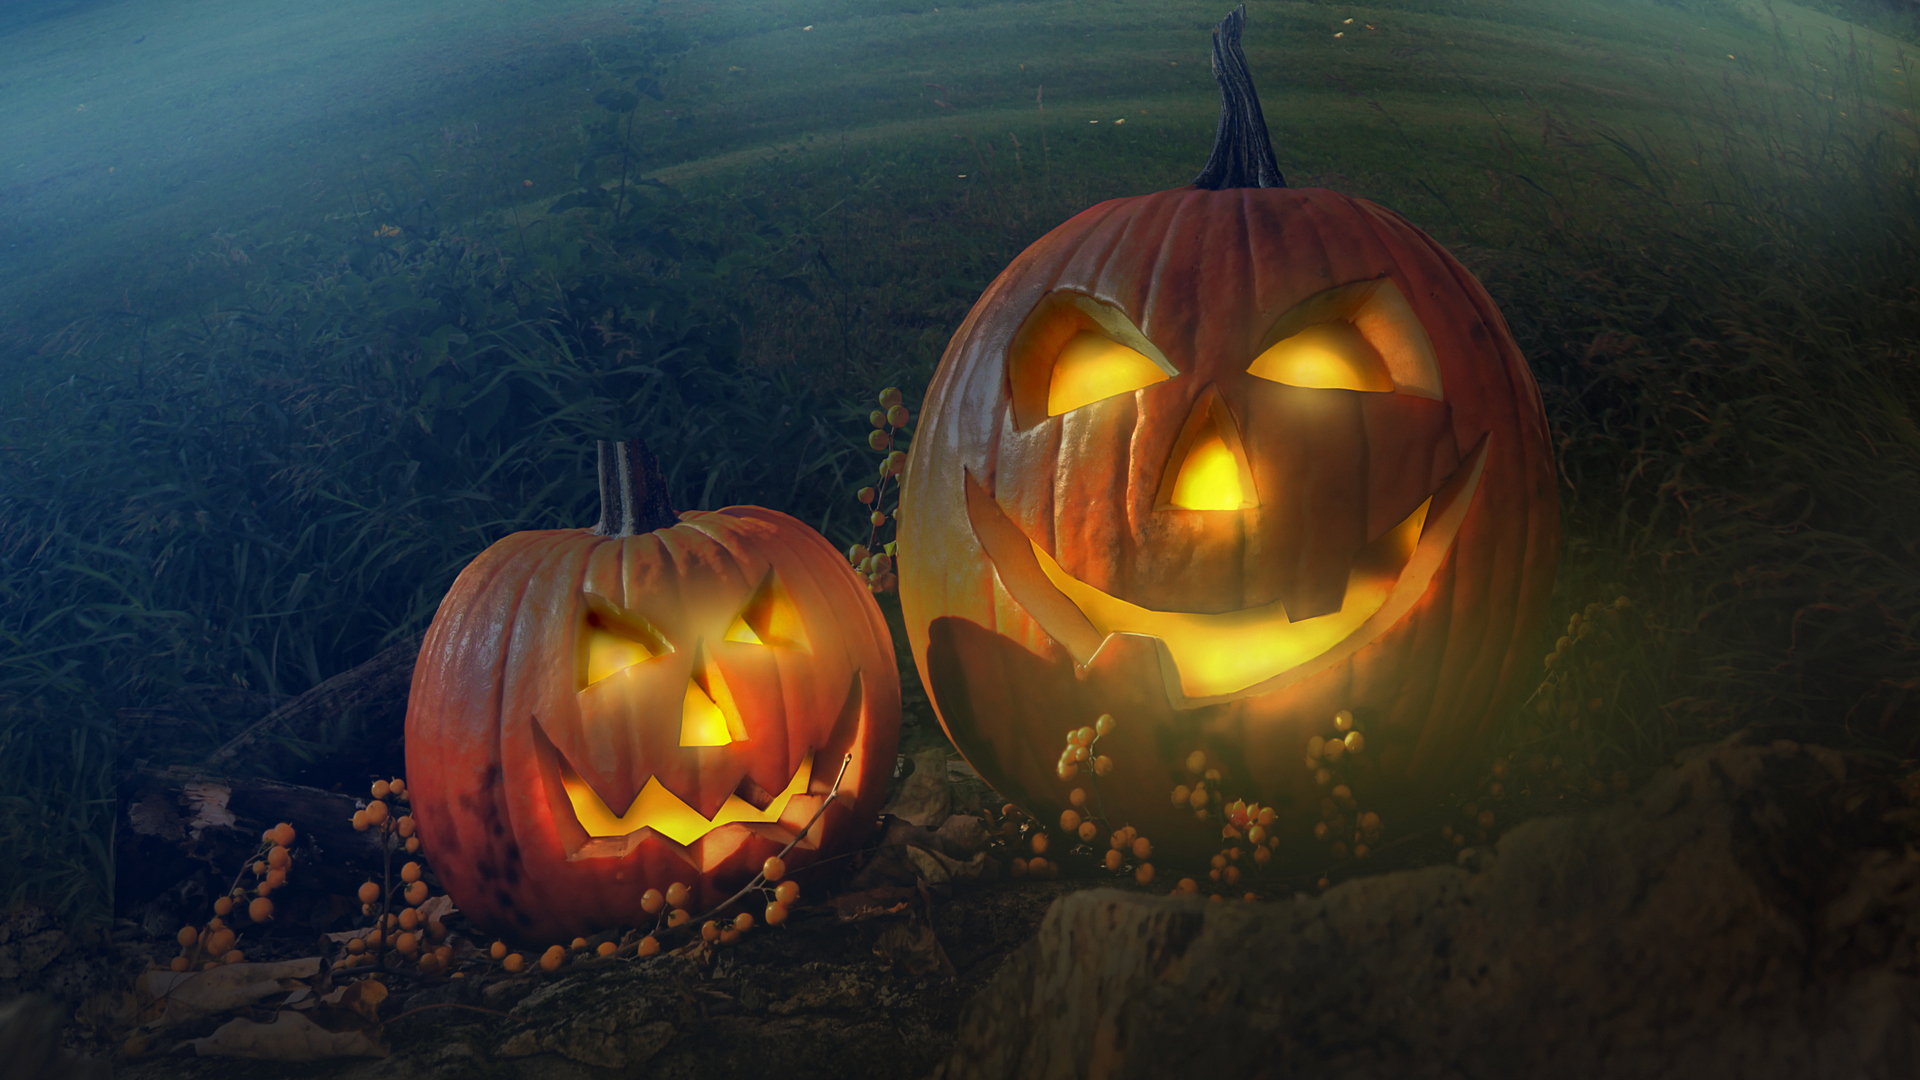 [47+] 1920x1080 HD Halloween Wallpaper on WallpaperSafari